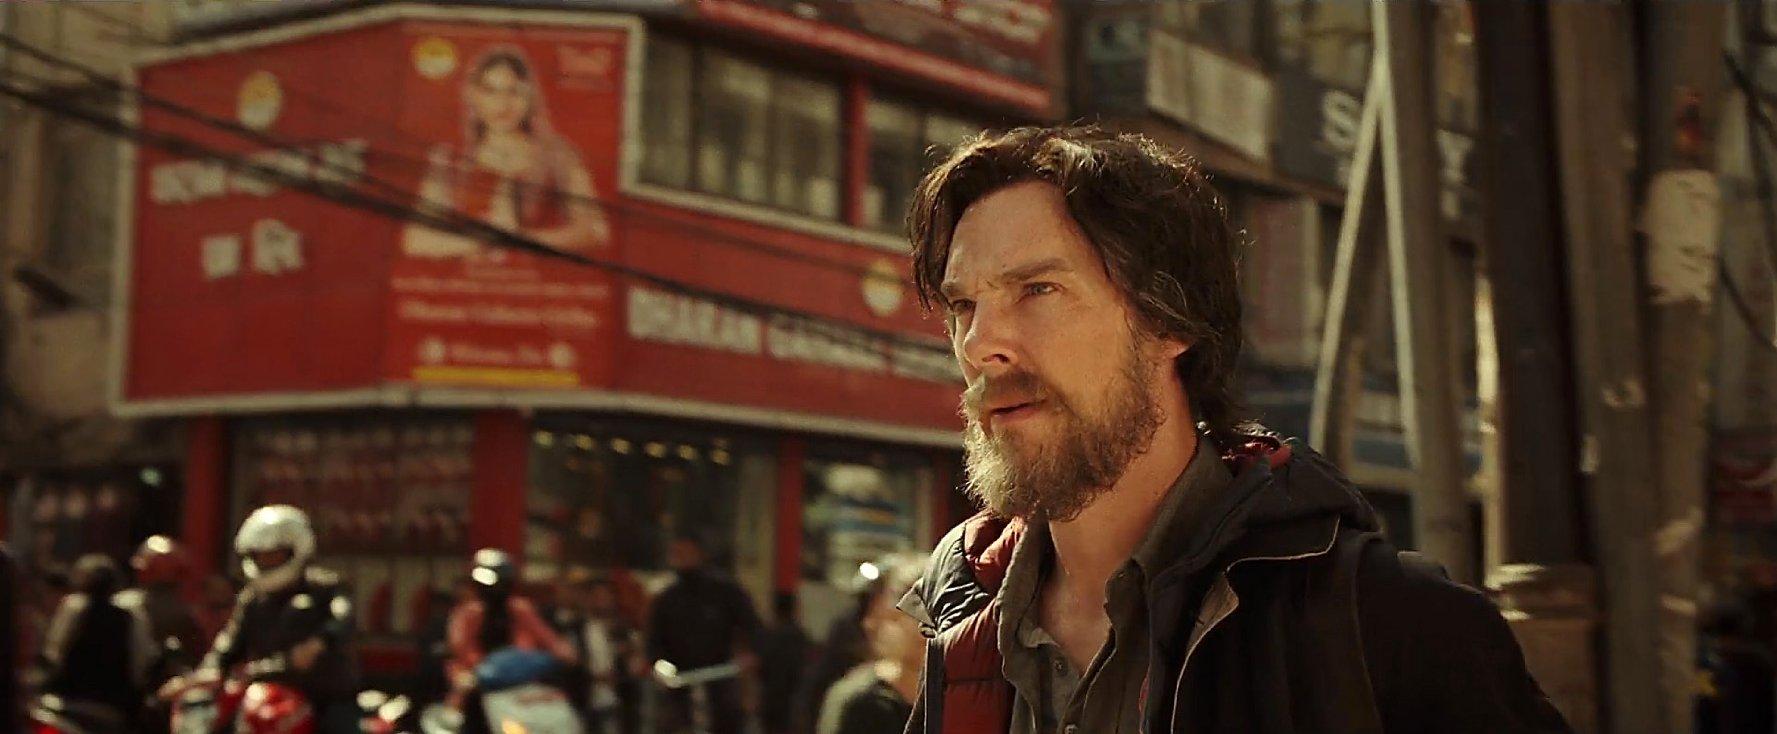 Benedict Cumberbacth dans le rôle de Stephen Strange. Source IMDB